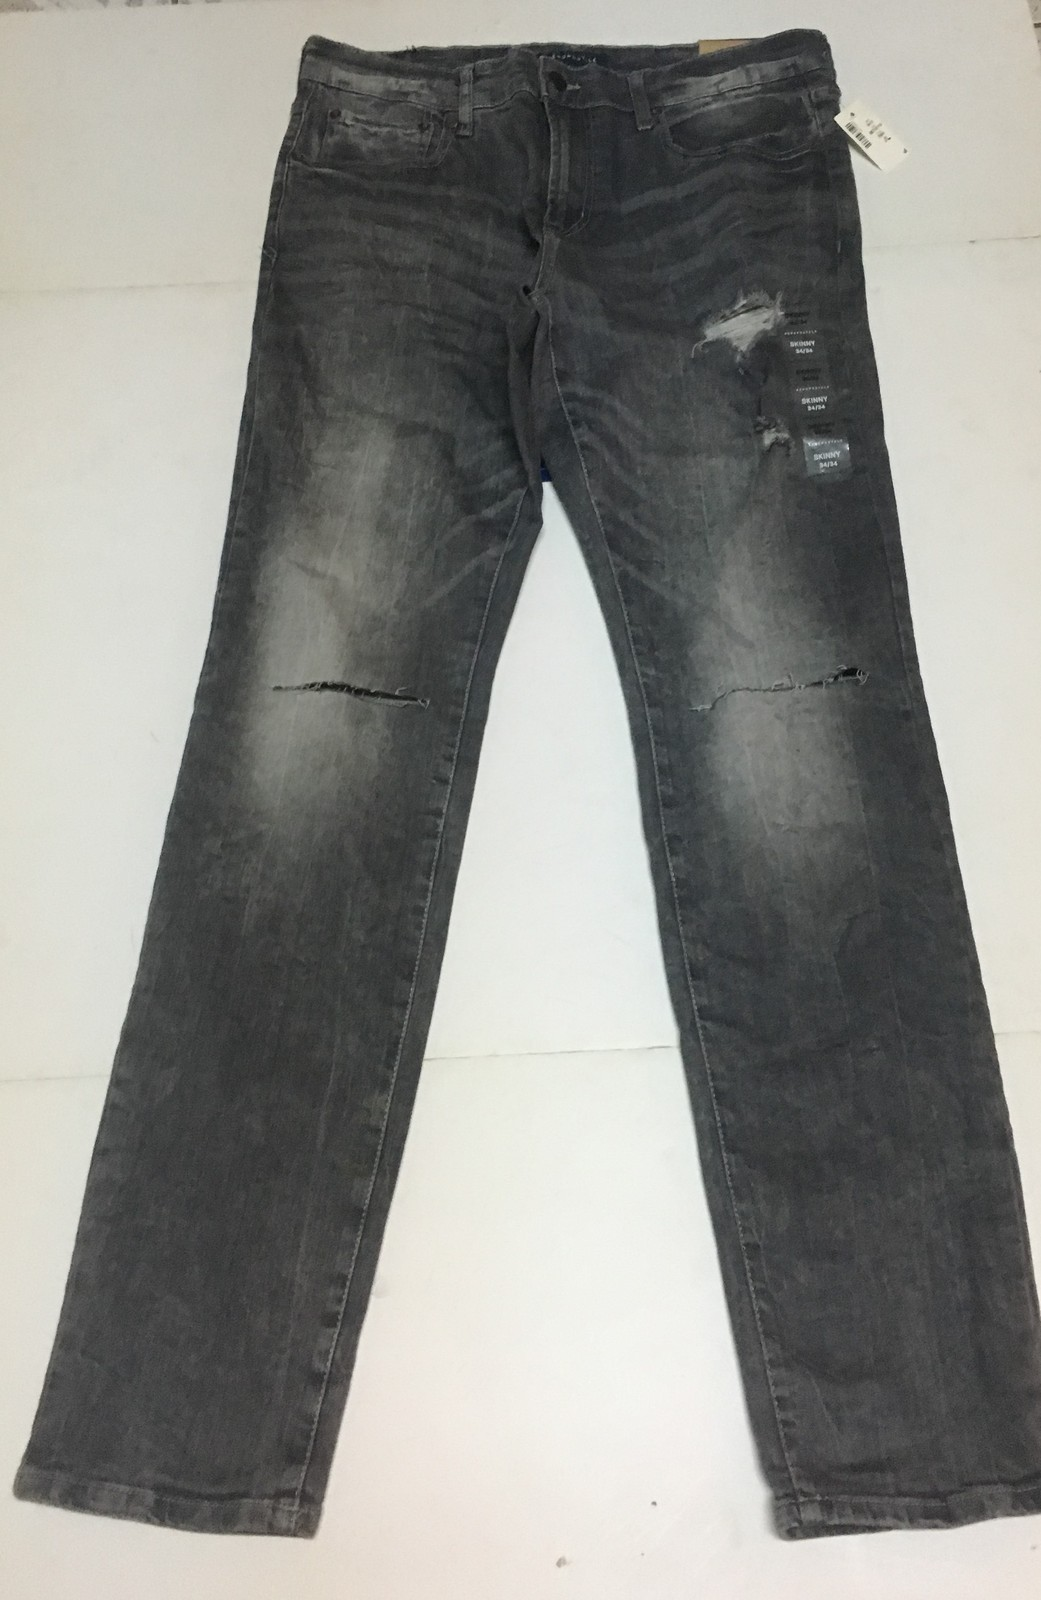 Aeropostale Distressed Jeans Dark SZ 34/34